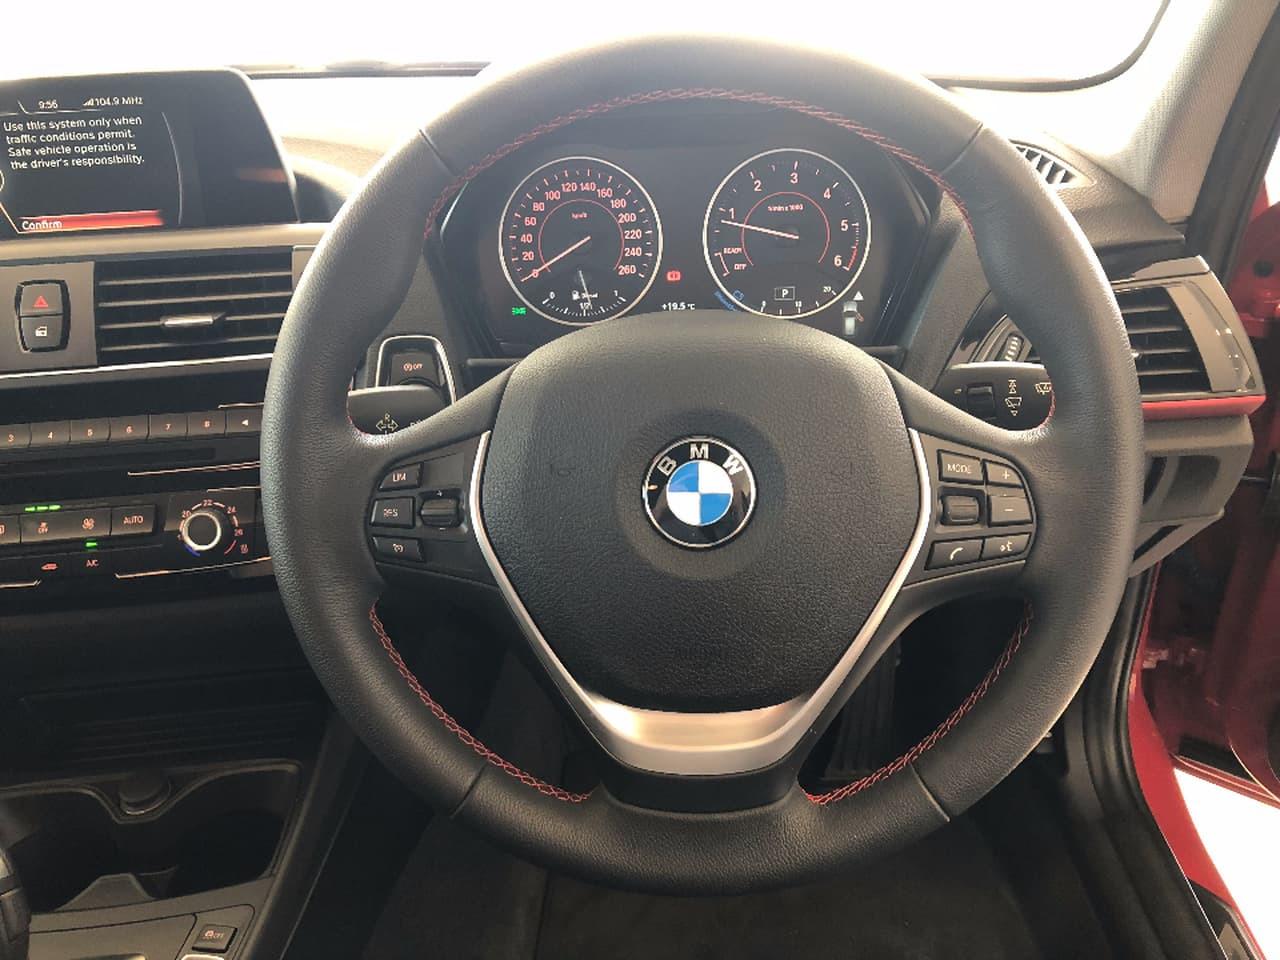 2017 BMW 1 Series F20 LCI Sport Line Hatchback